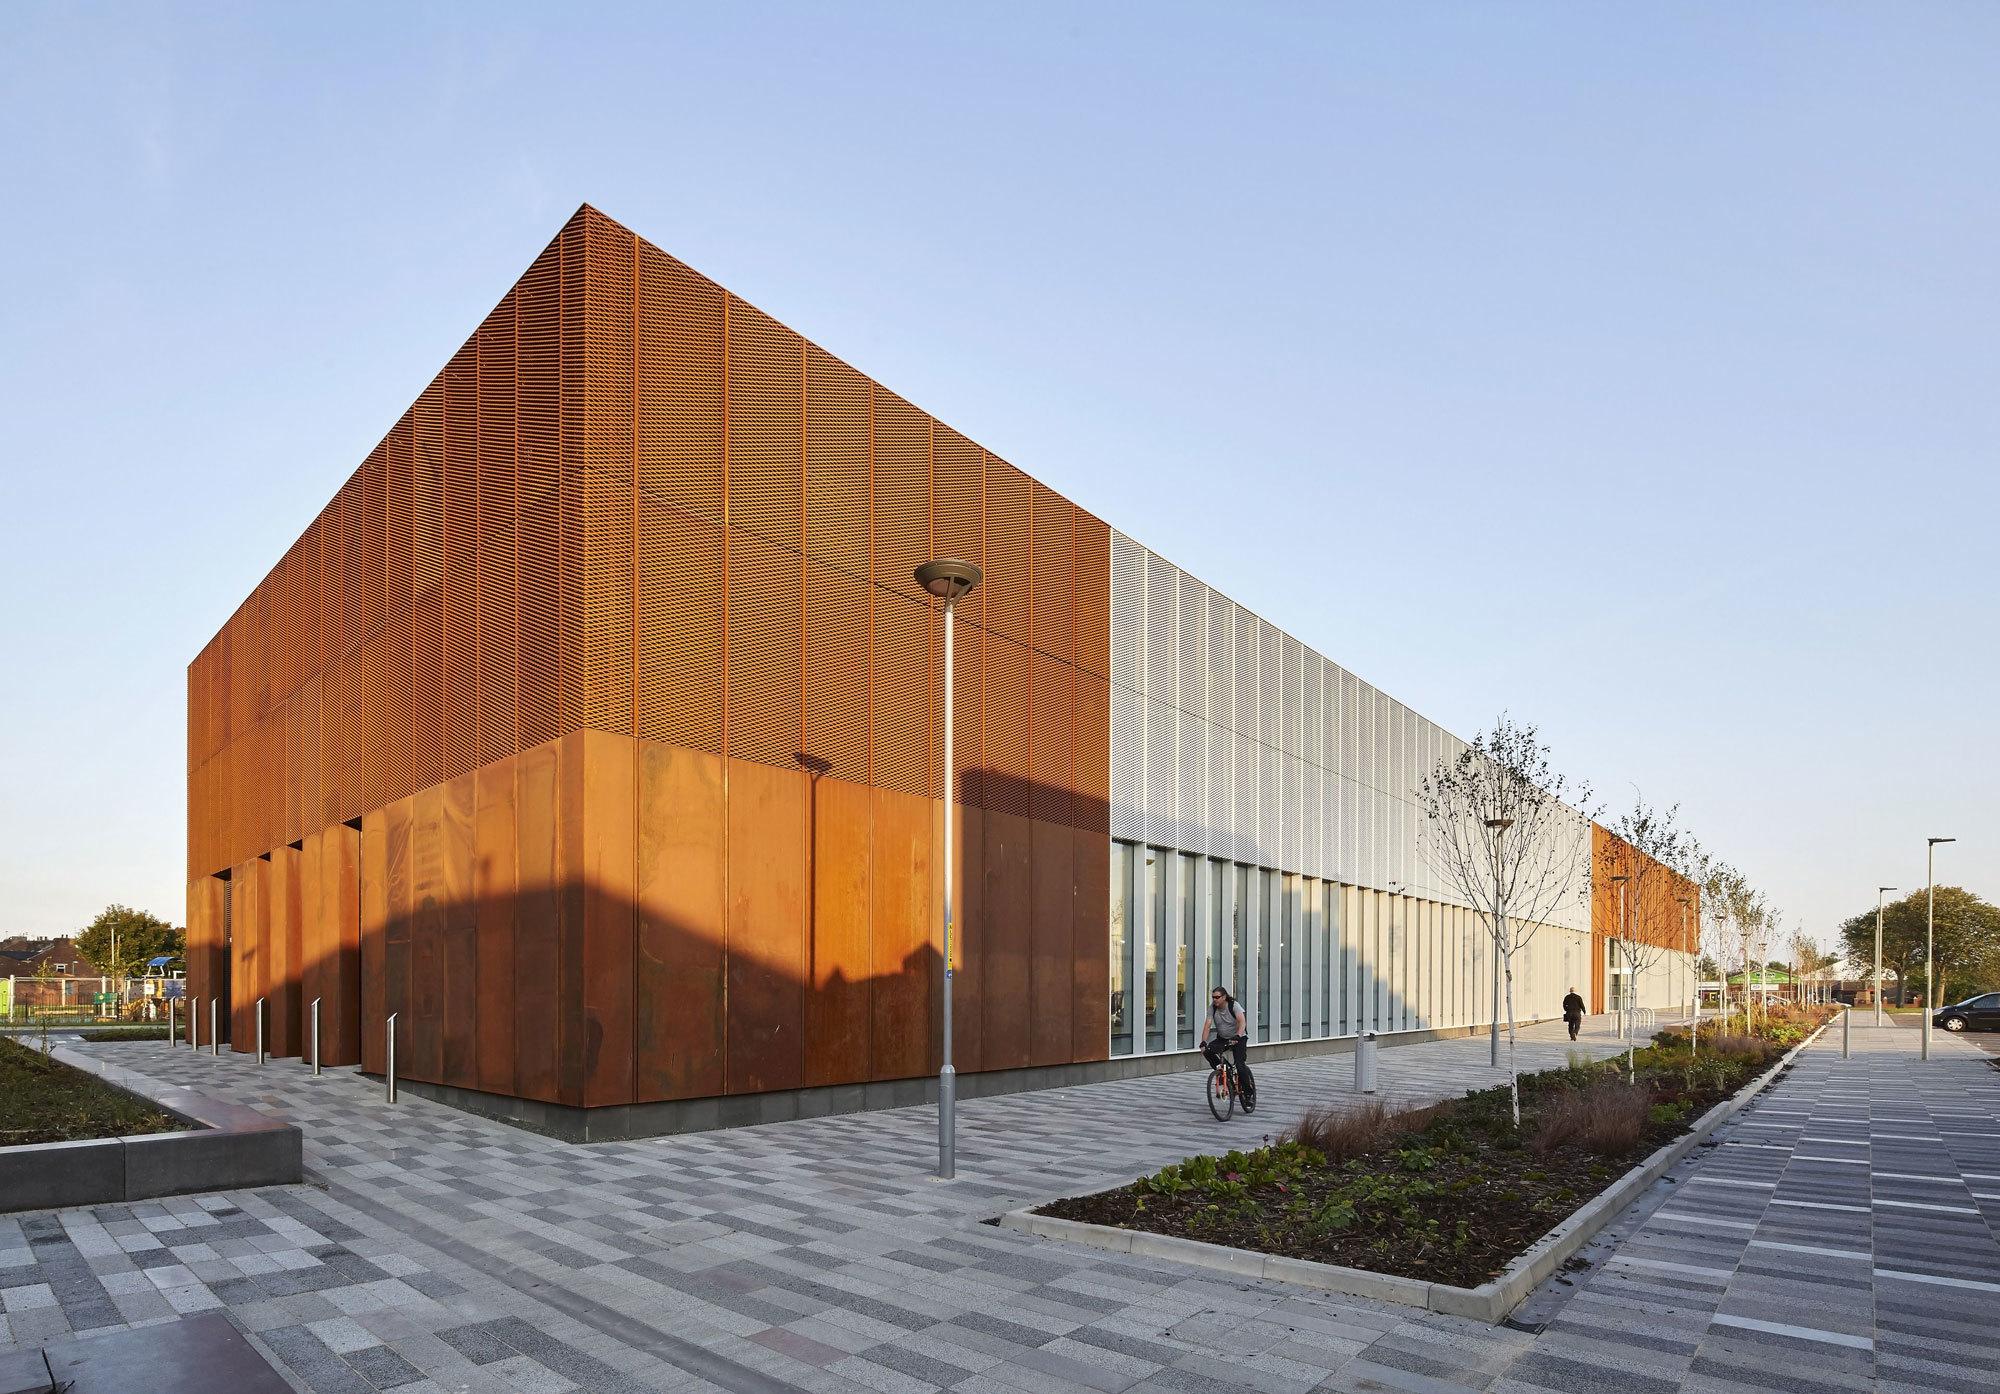 Hebburn Central: part library, part sports centre, part workplace